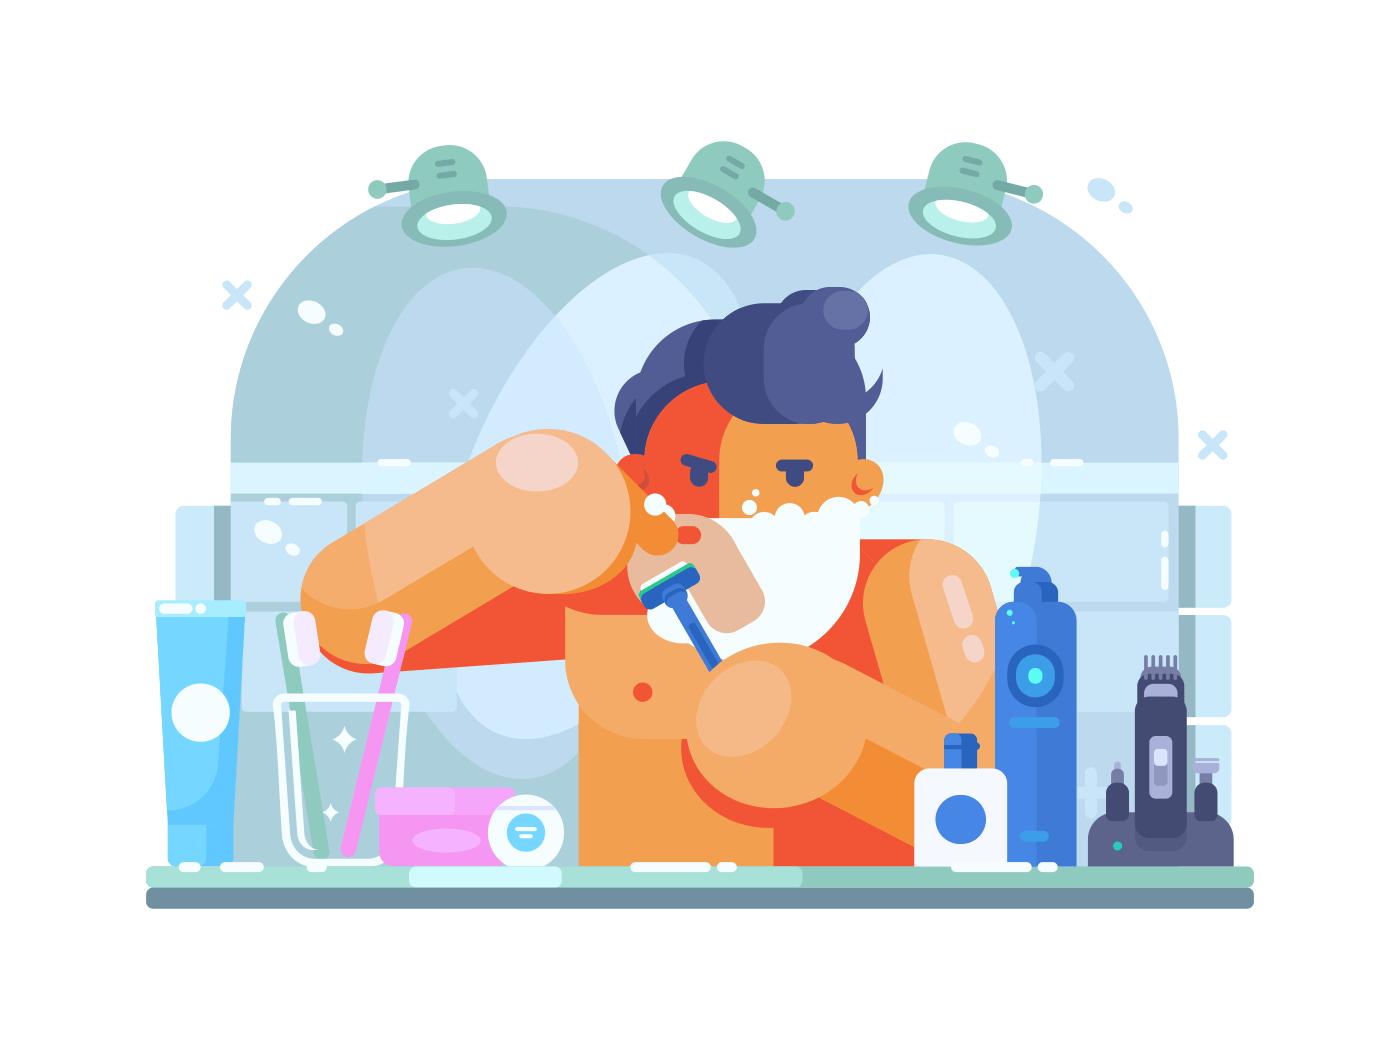 Man in bathroom shaves illustration